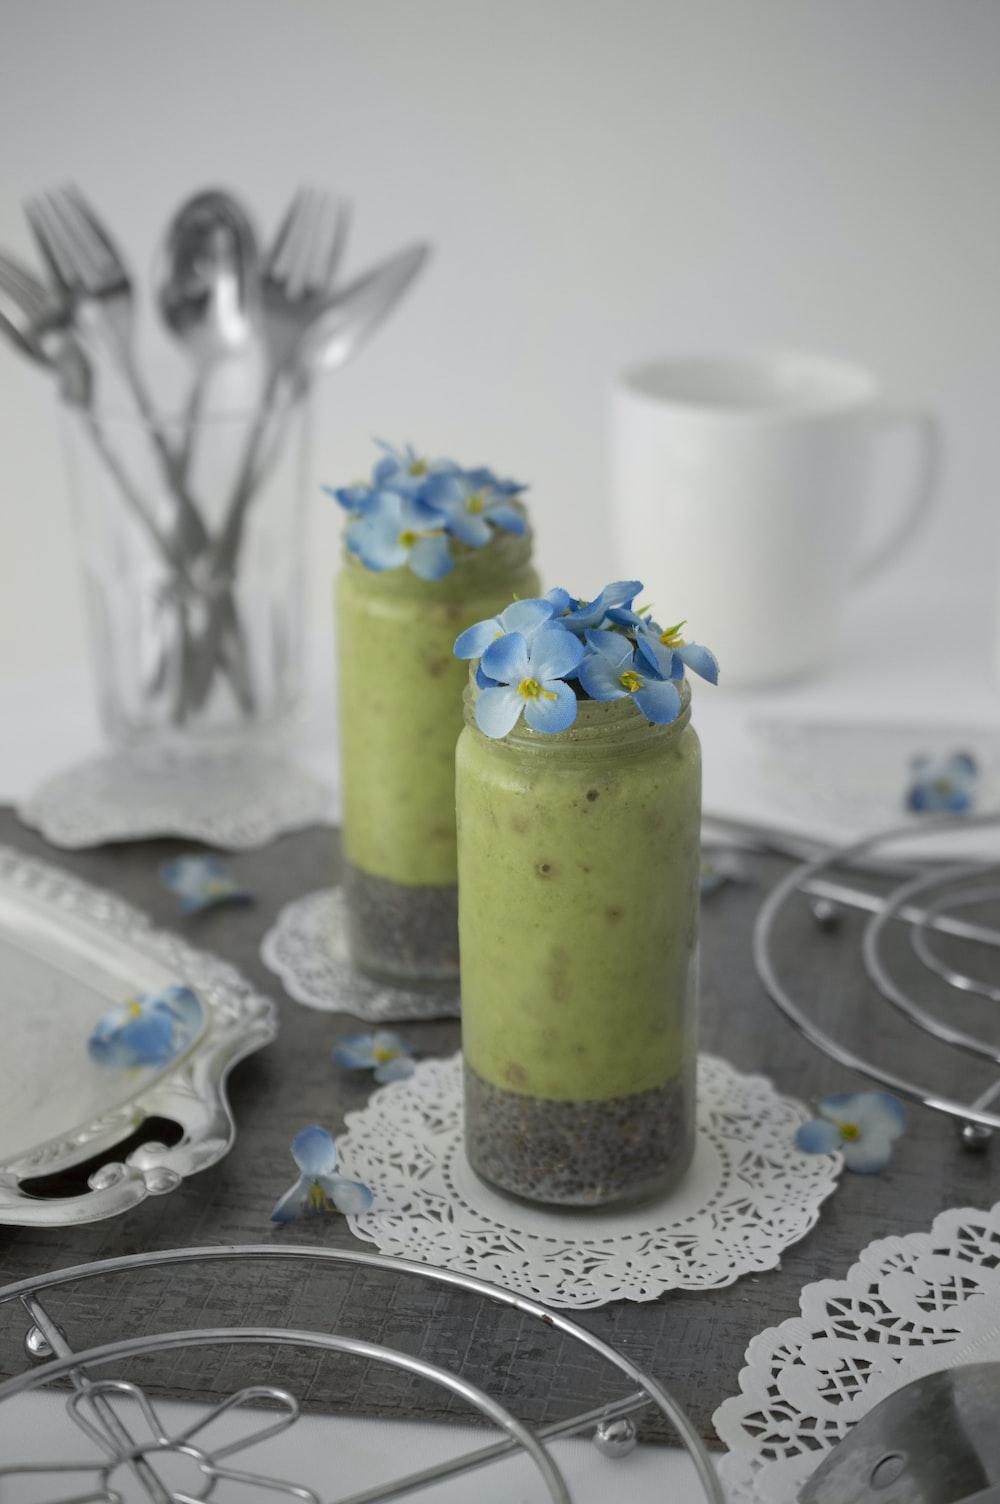 blue petaled flower in glass on table beside plates